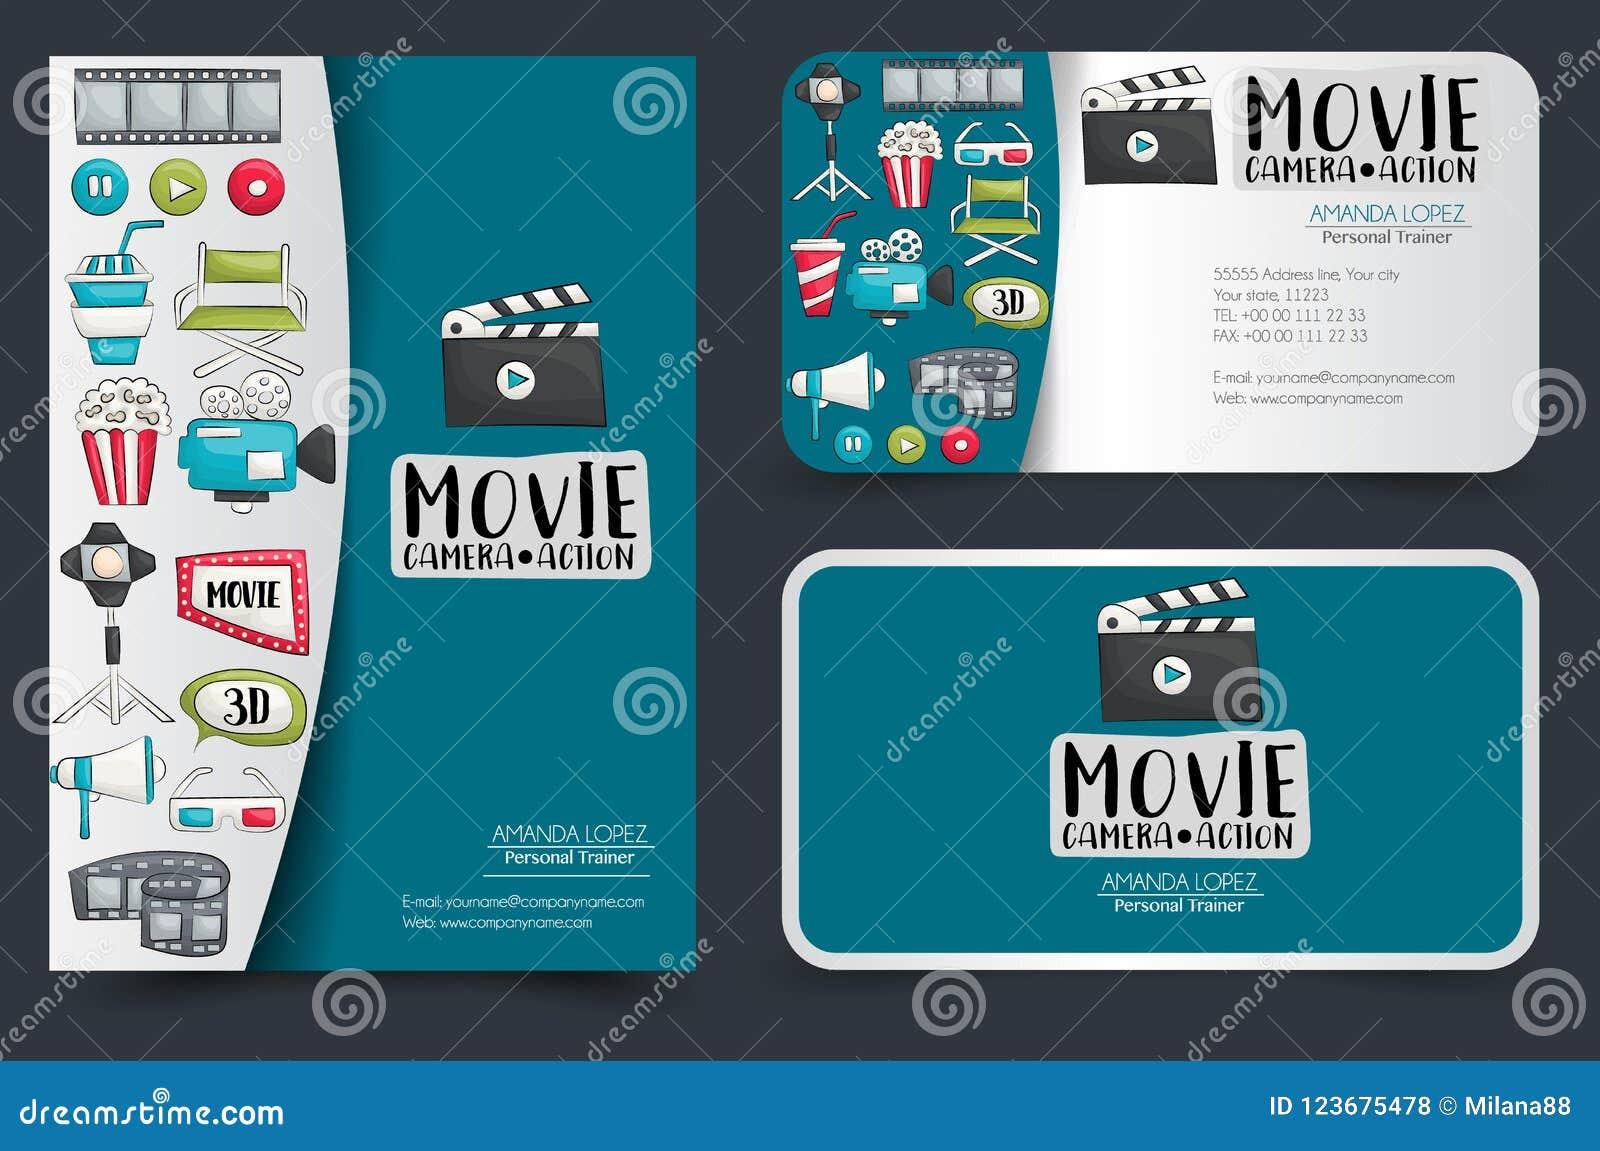 Movie cinema corporate identity design set flyer and business cards download movie cinema corporate identity design set flyer and business cards stock vector colourmoves